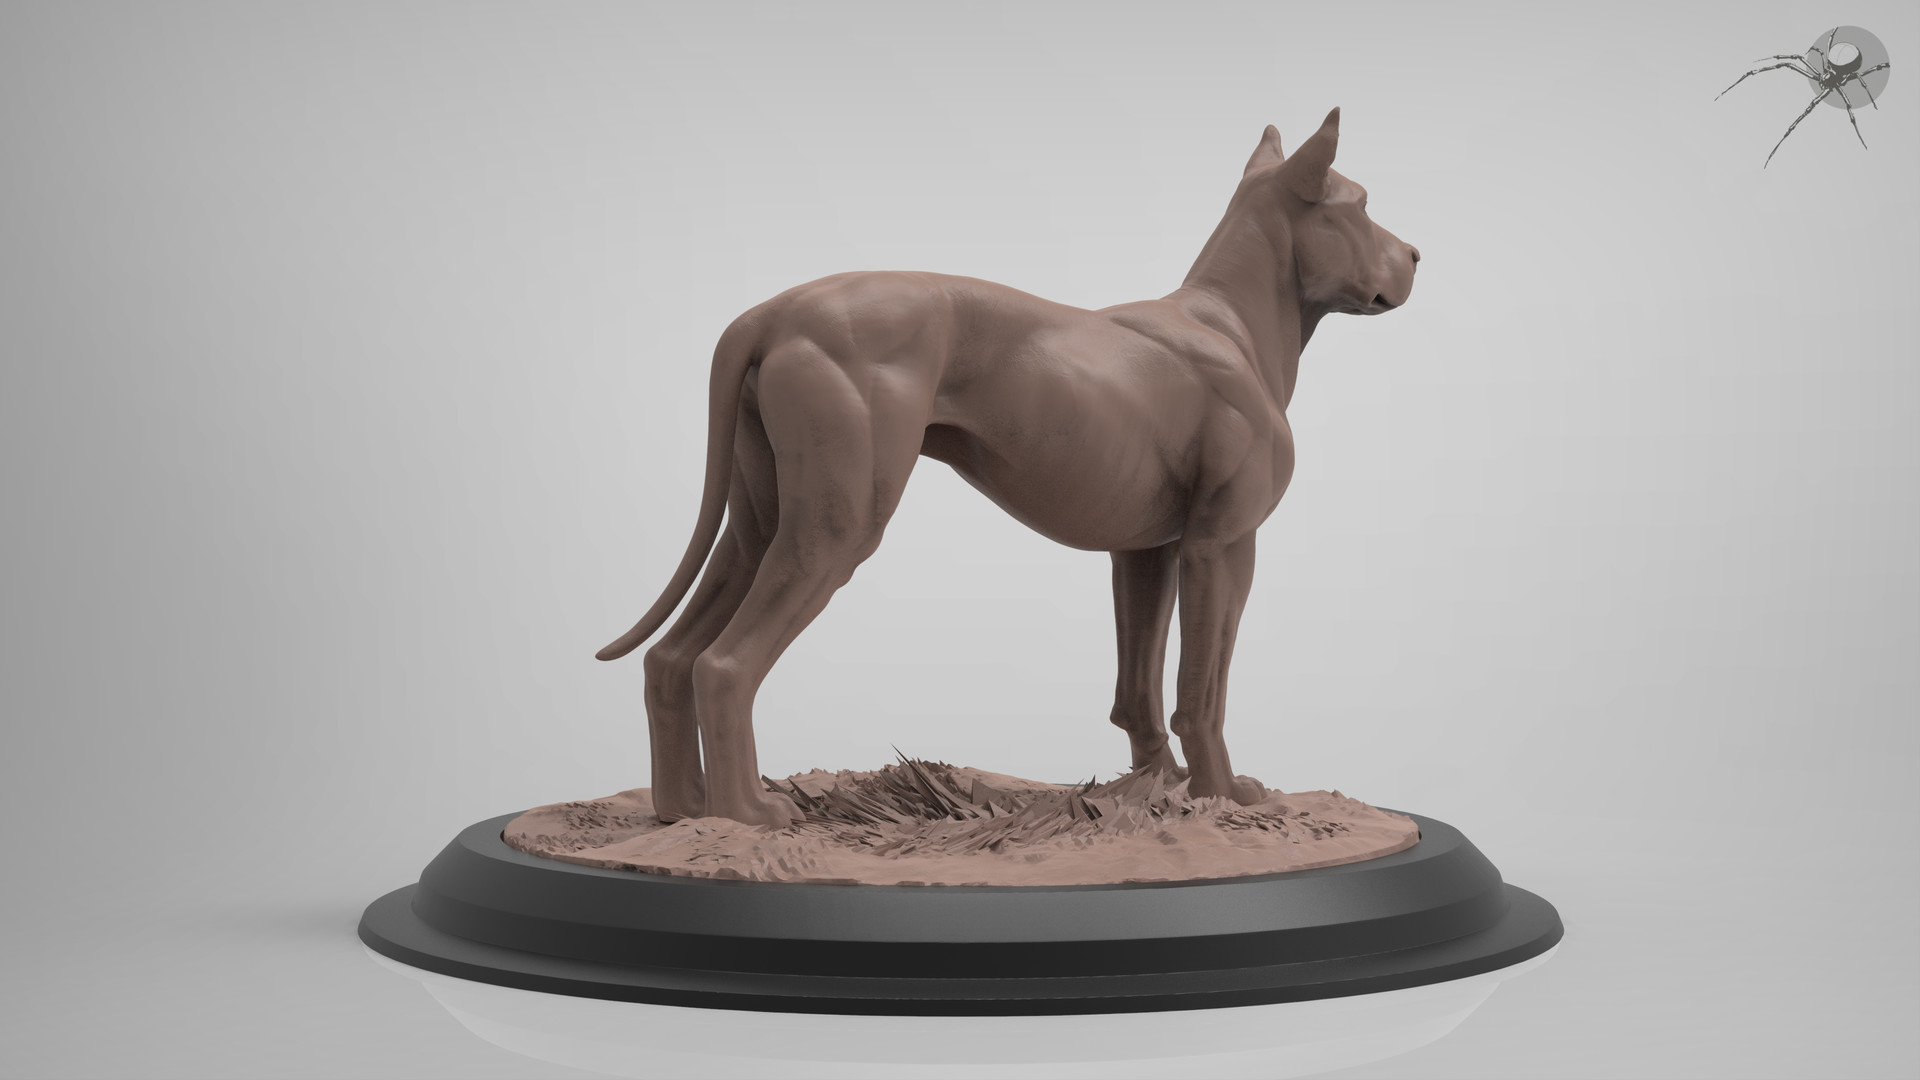 ArtStation - Canine Anatomy (Dog), Marcus Trolldenier